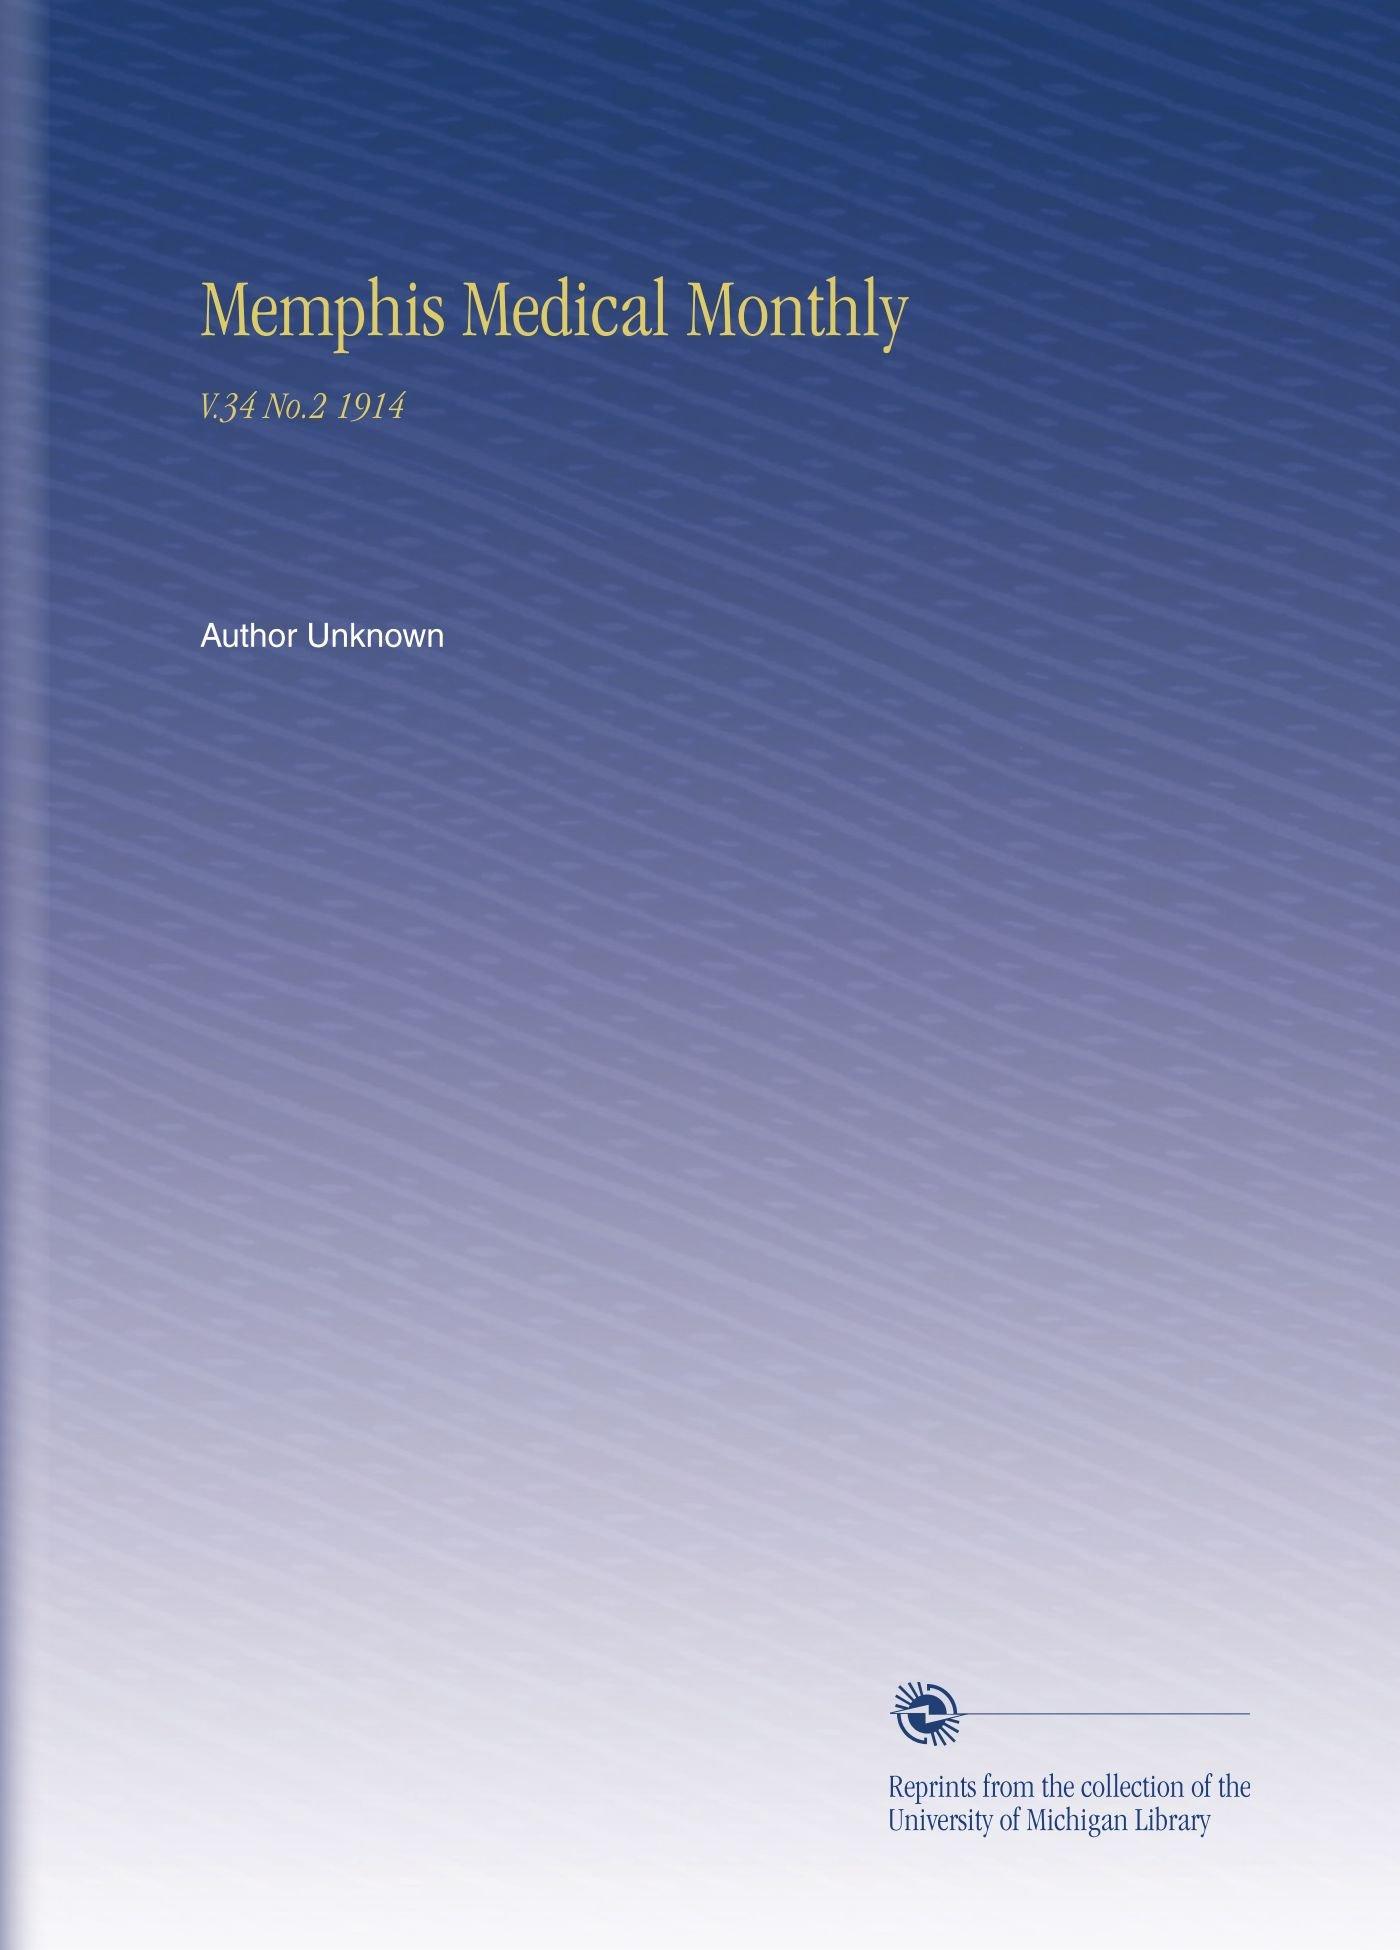 Read Online Memphis Medical Monthly: V.34 No.2 1914 PDF